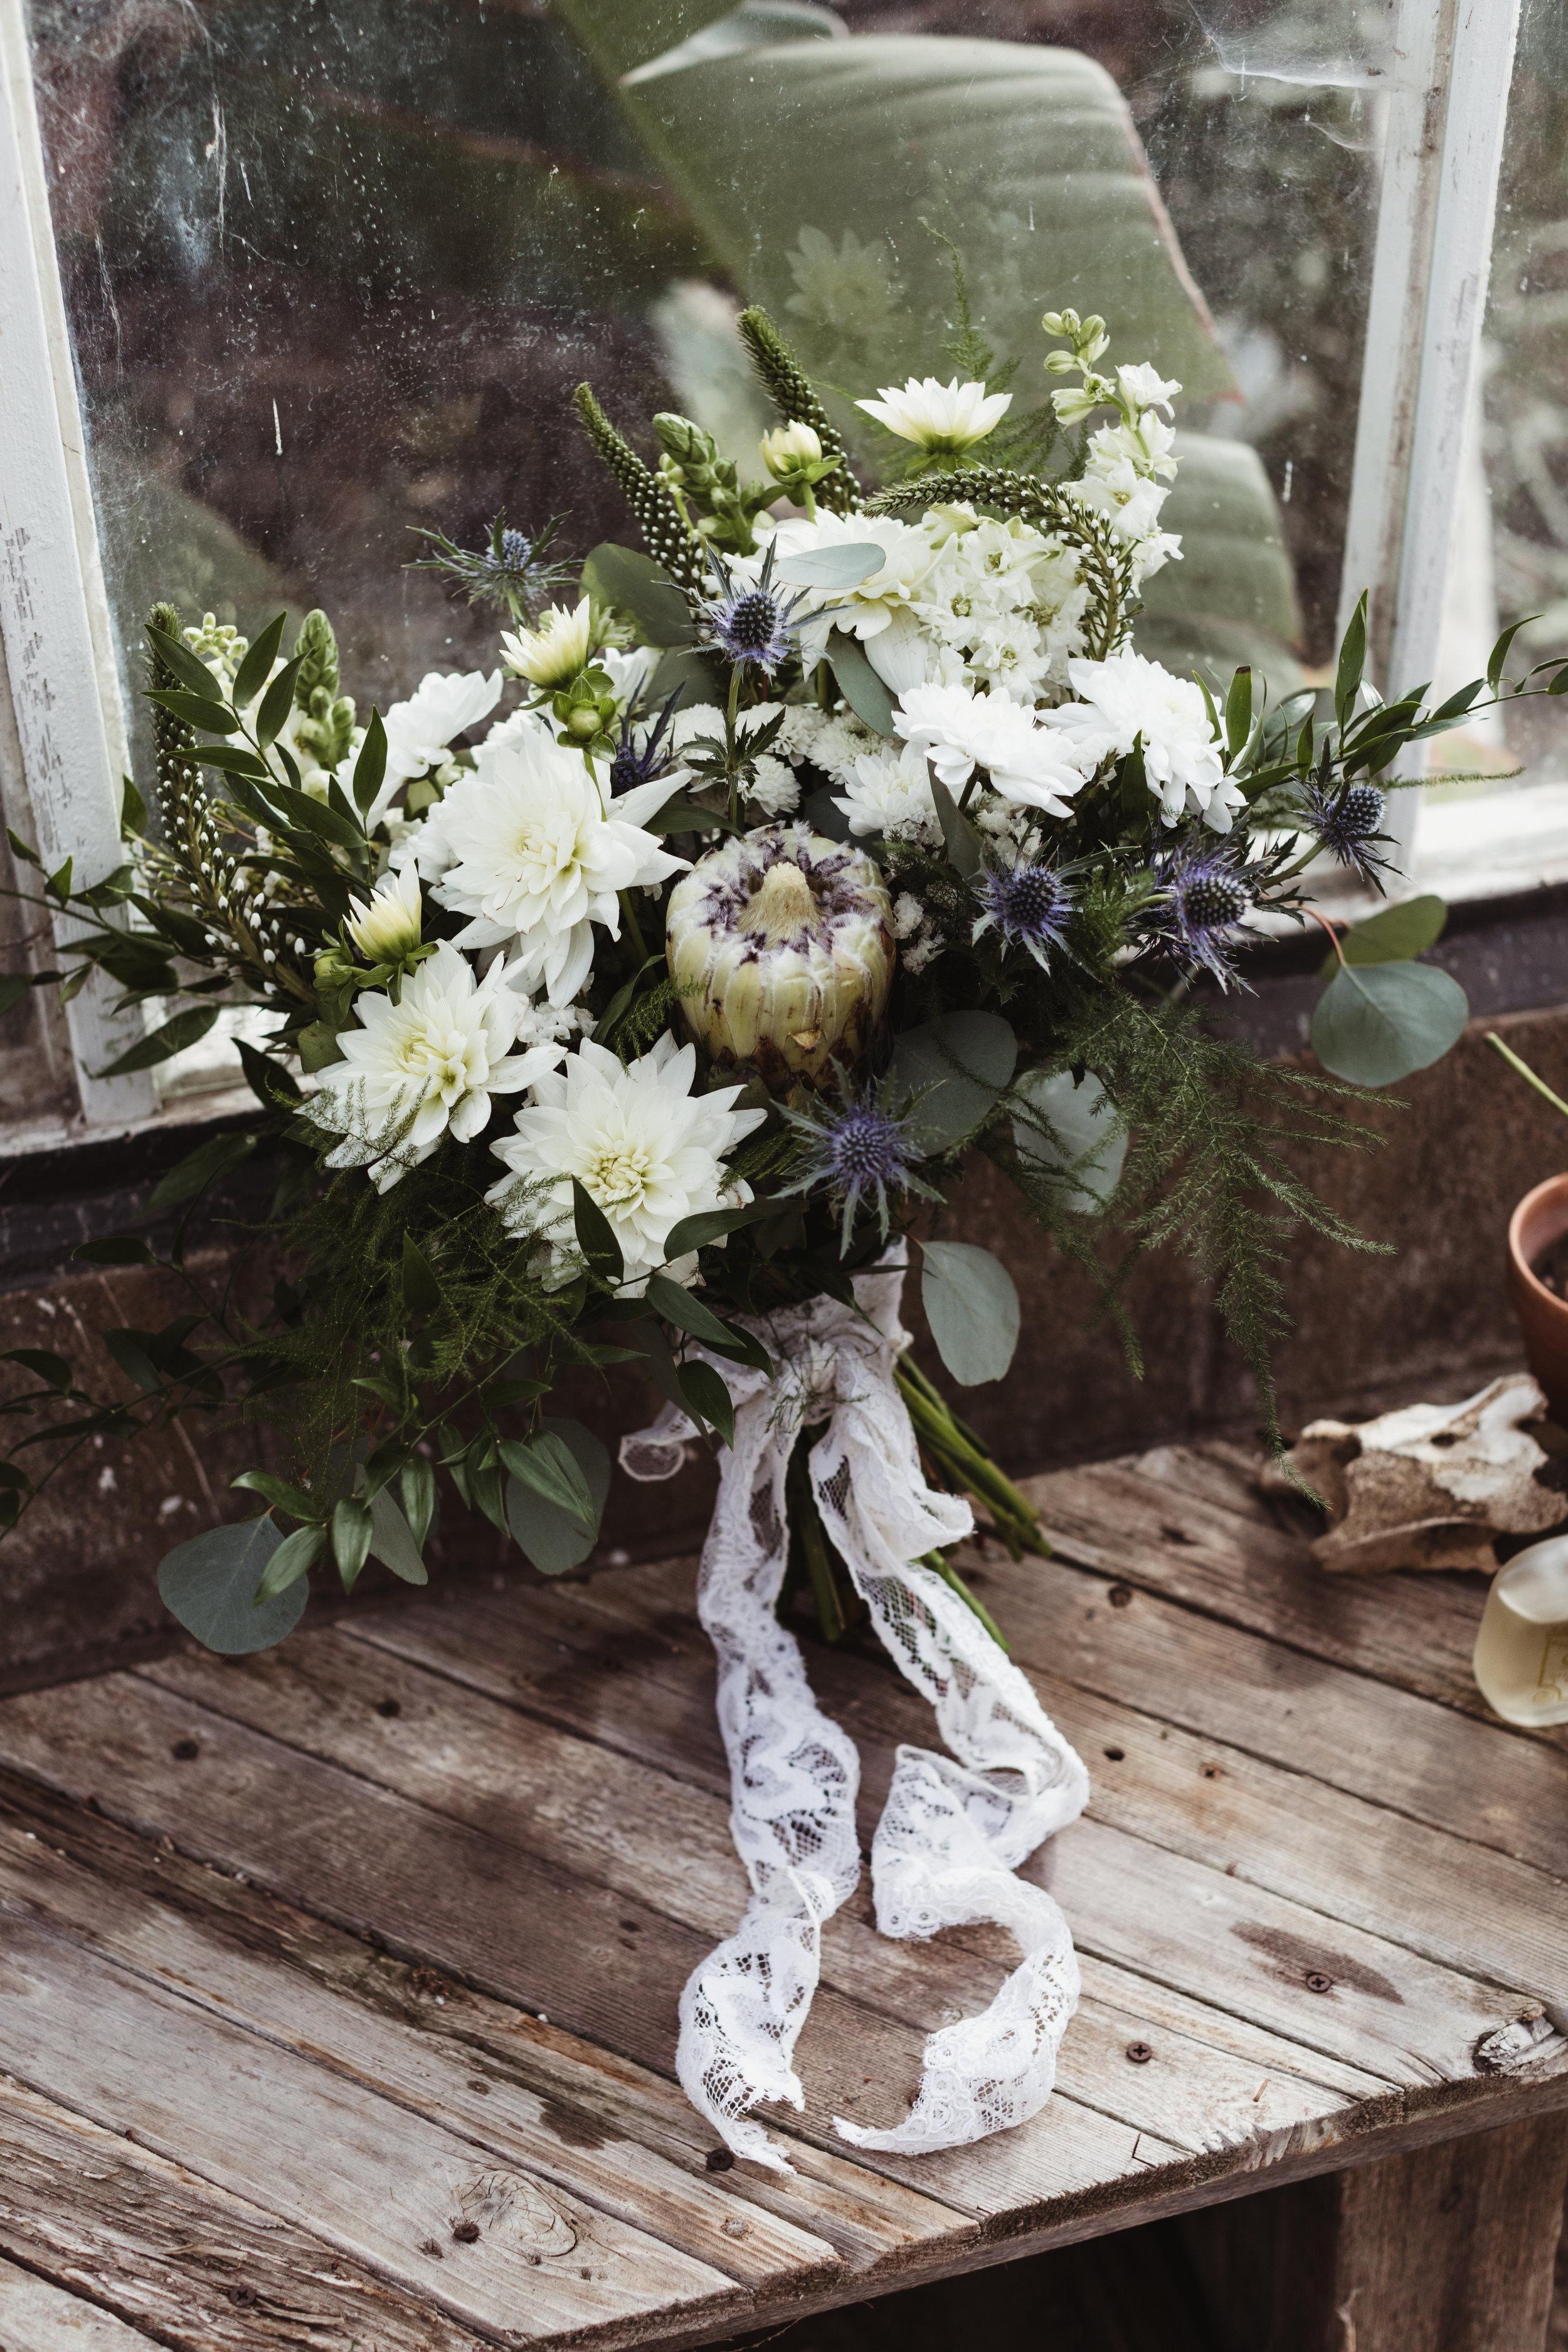 Jamie_English_Photography_JordanErik_Dos_Pueblos_Orchid_Wedding_Santa_Barbara_Fall2018-16.jpg